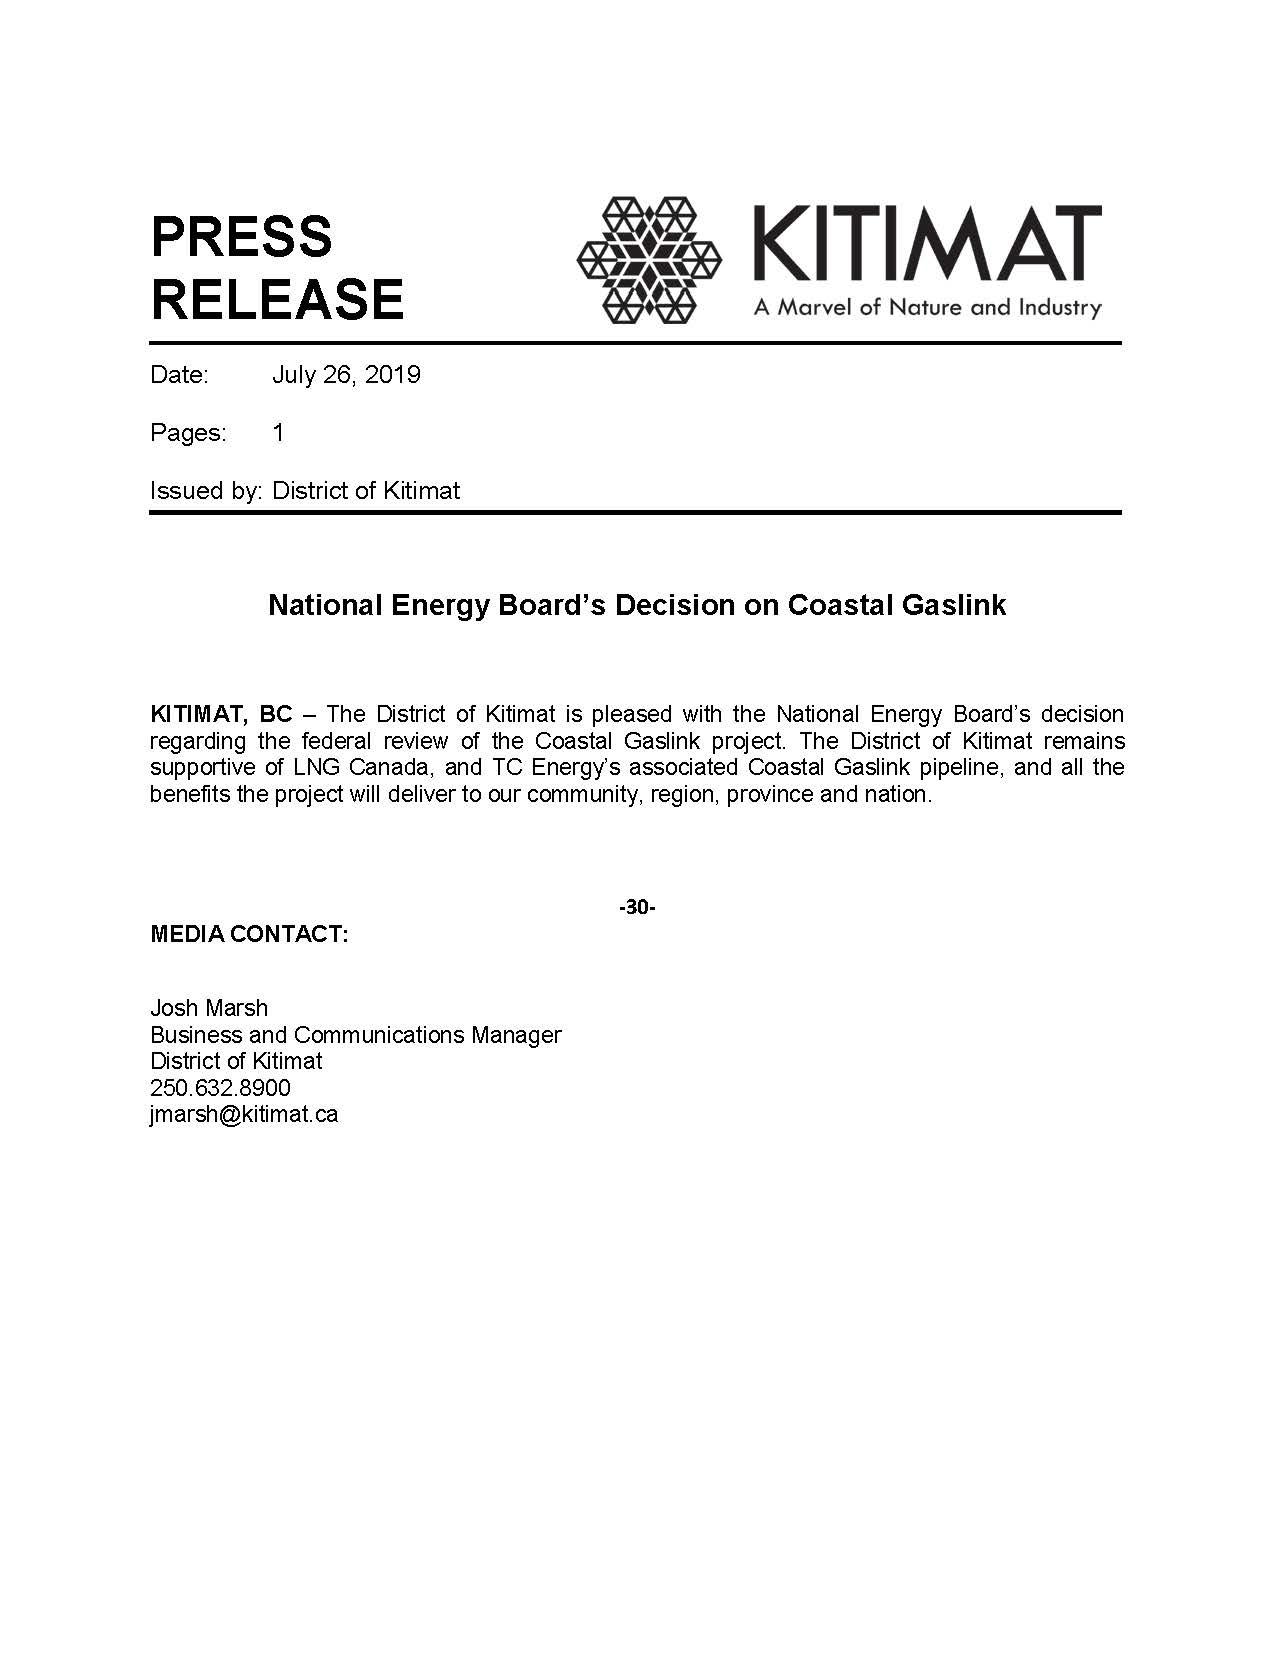 NEB Decision Re Coastal GasLink